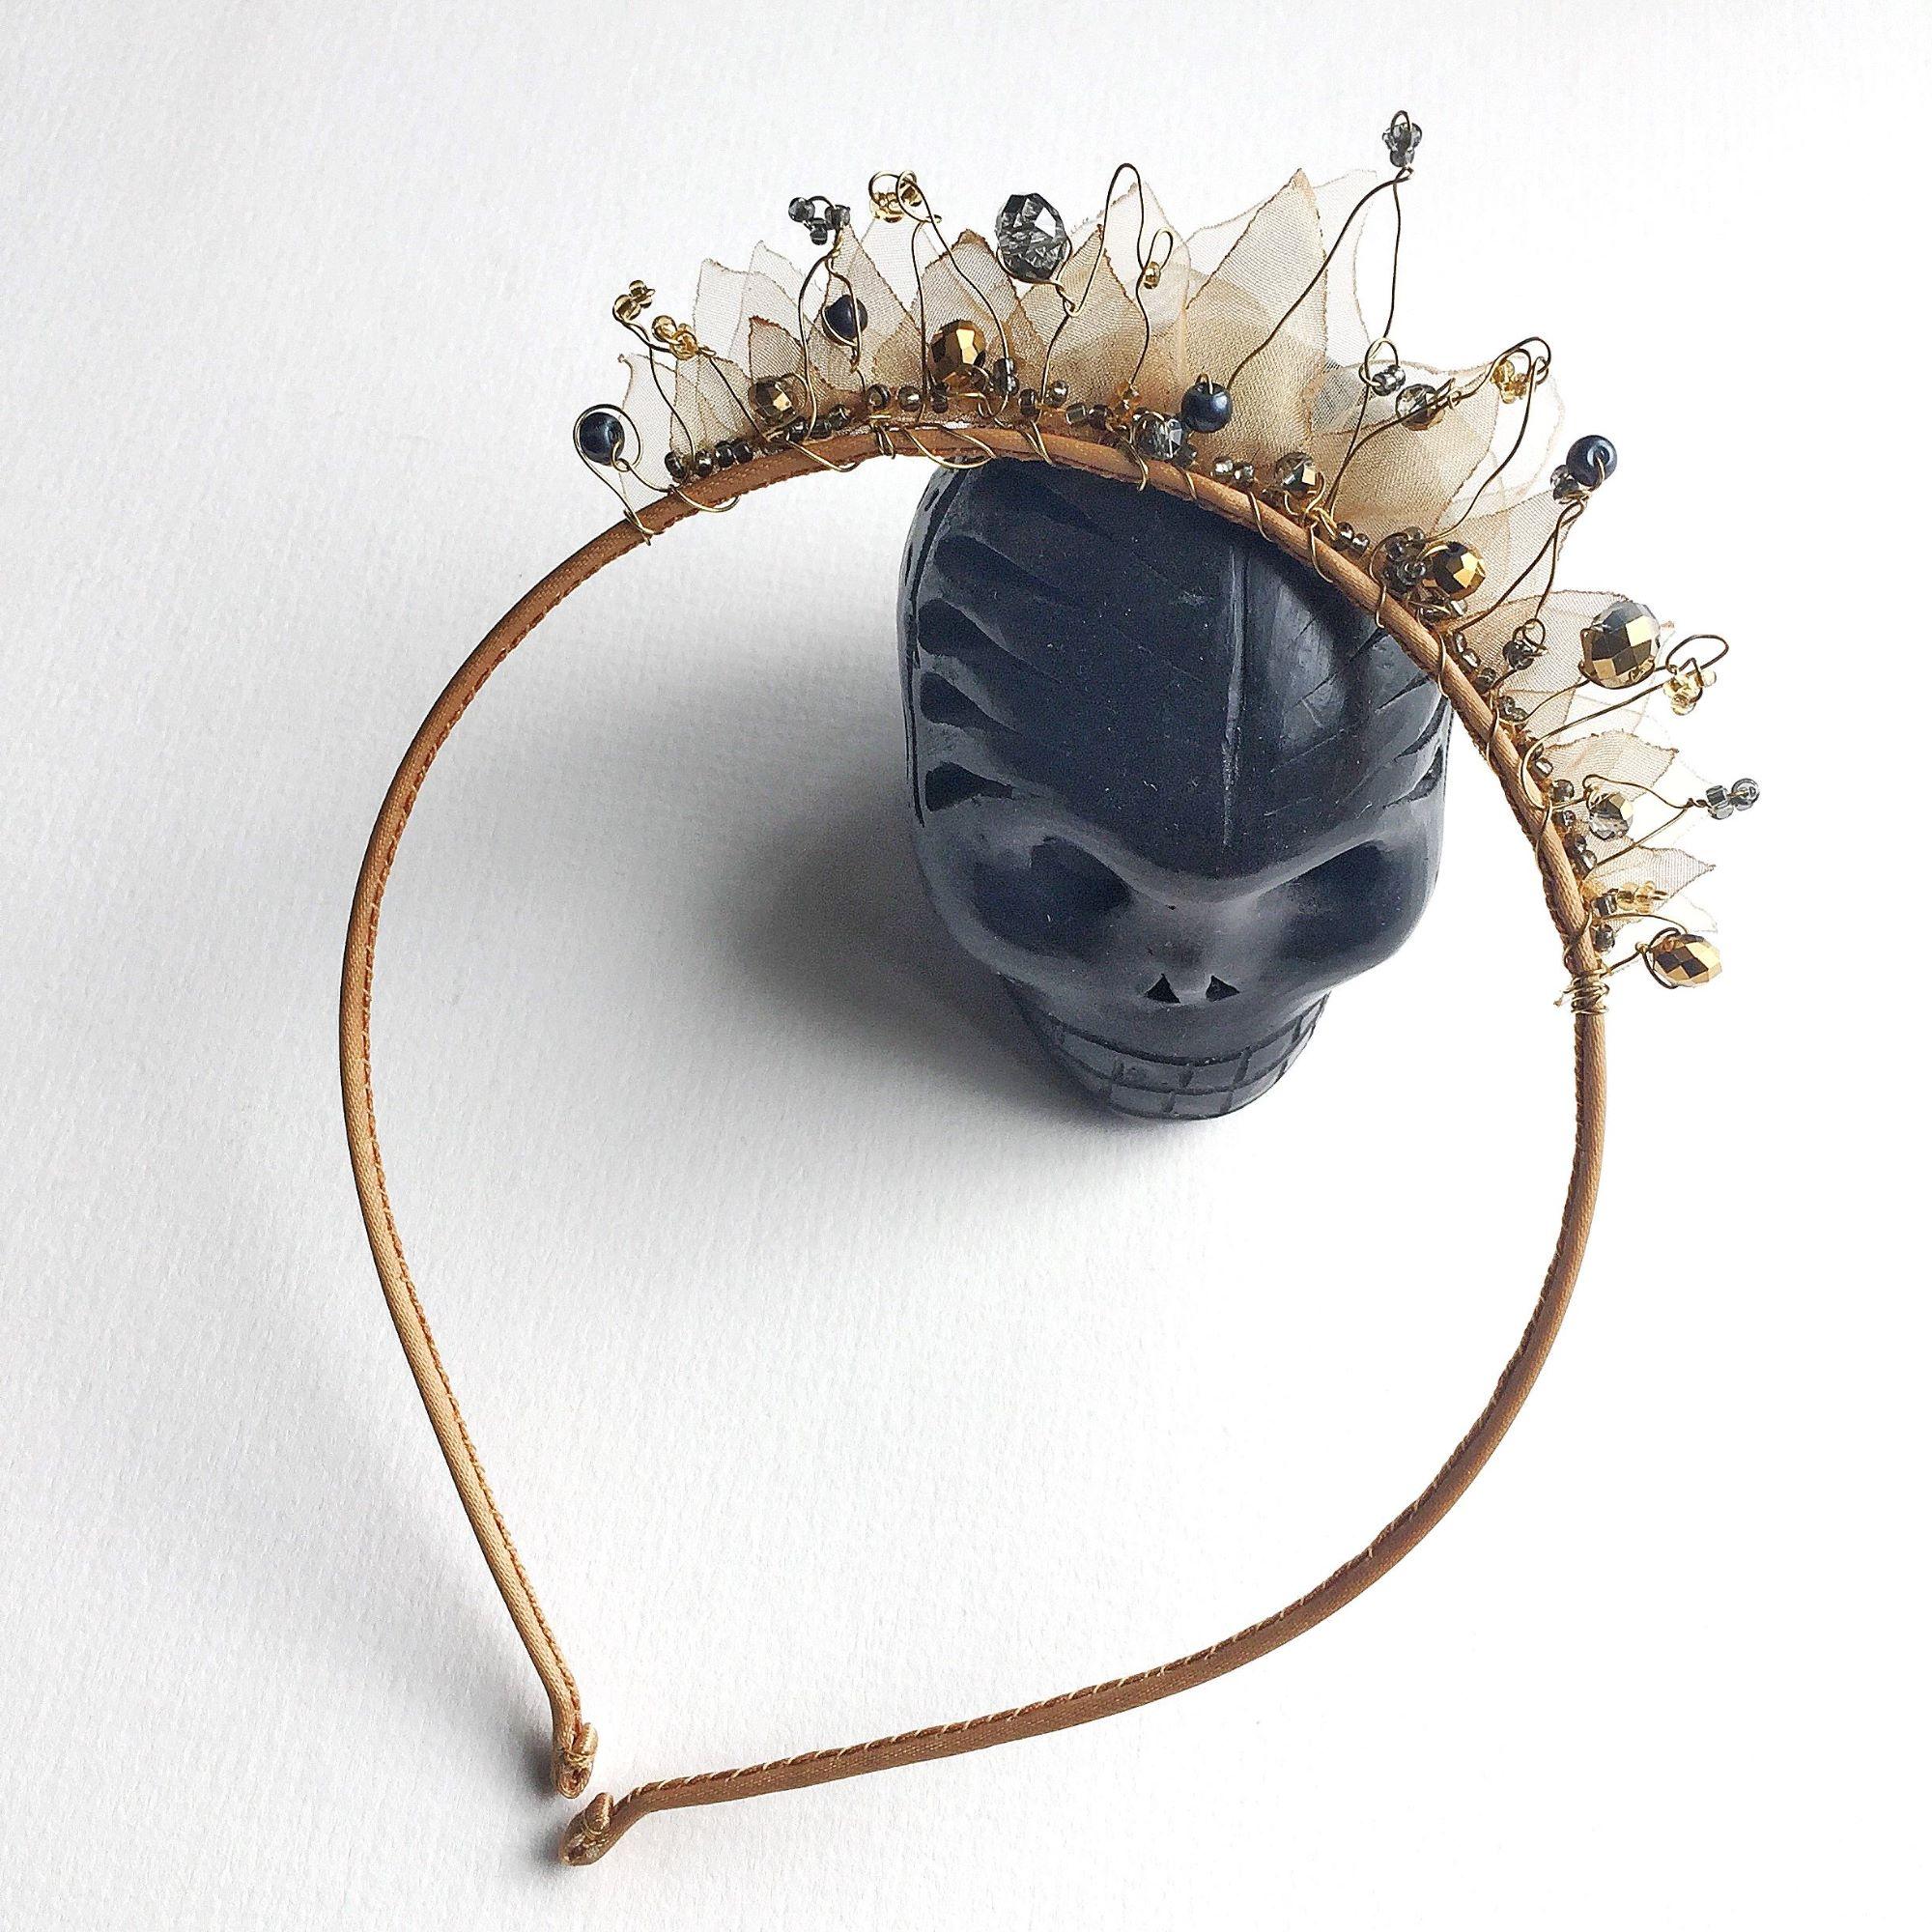 fairy wedding headband, fairy tale wedding, fantasy princess wedding headband, gold and grey woodland hair accessories